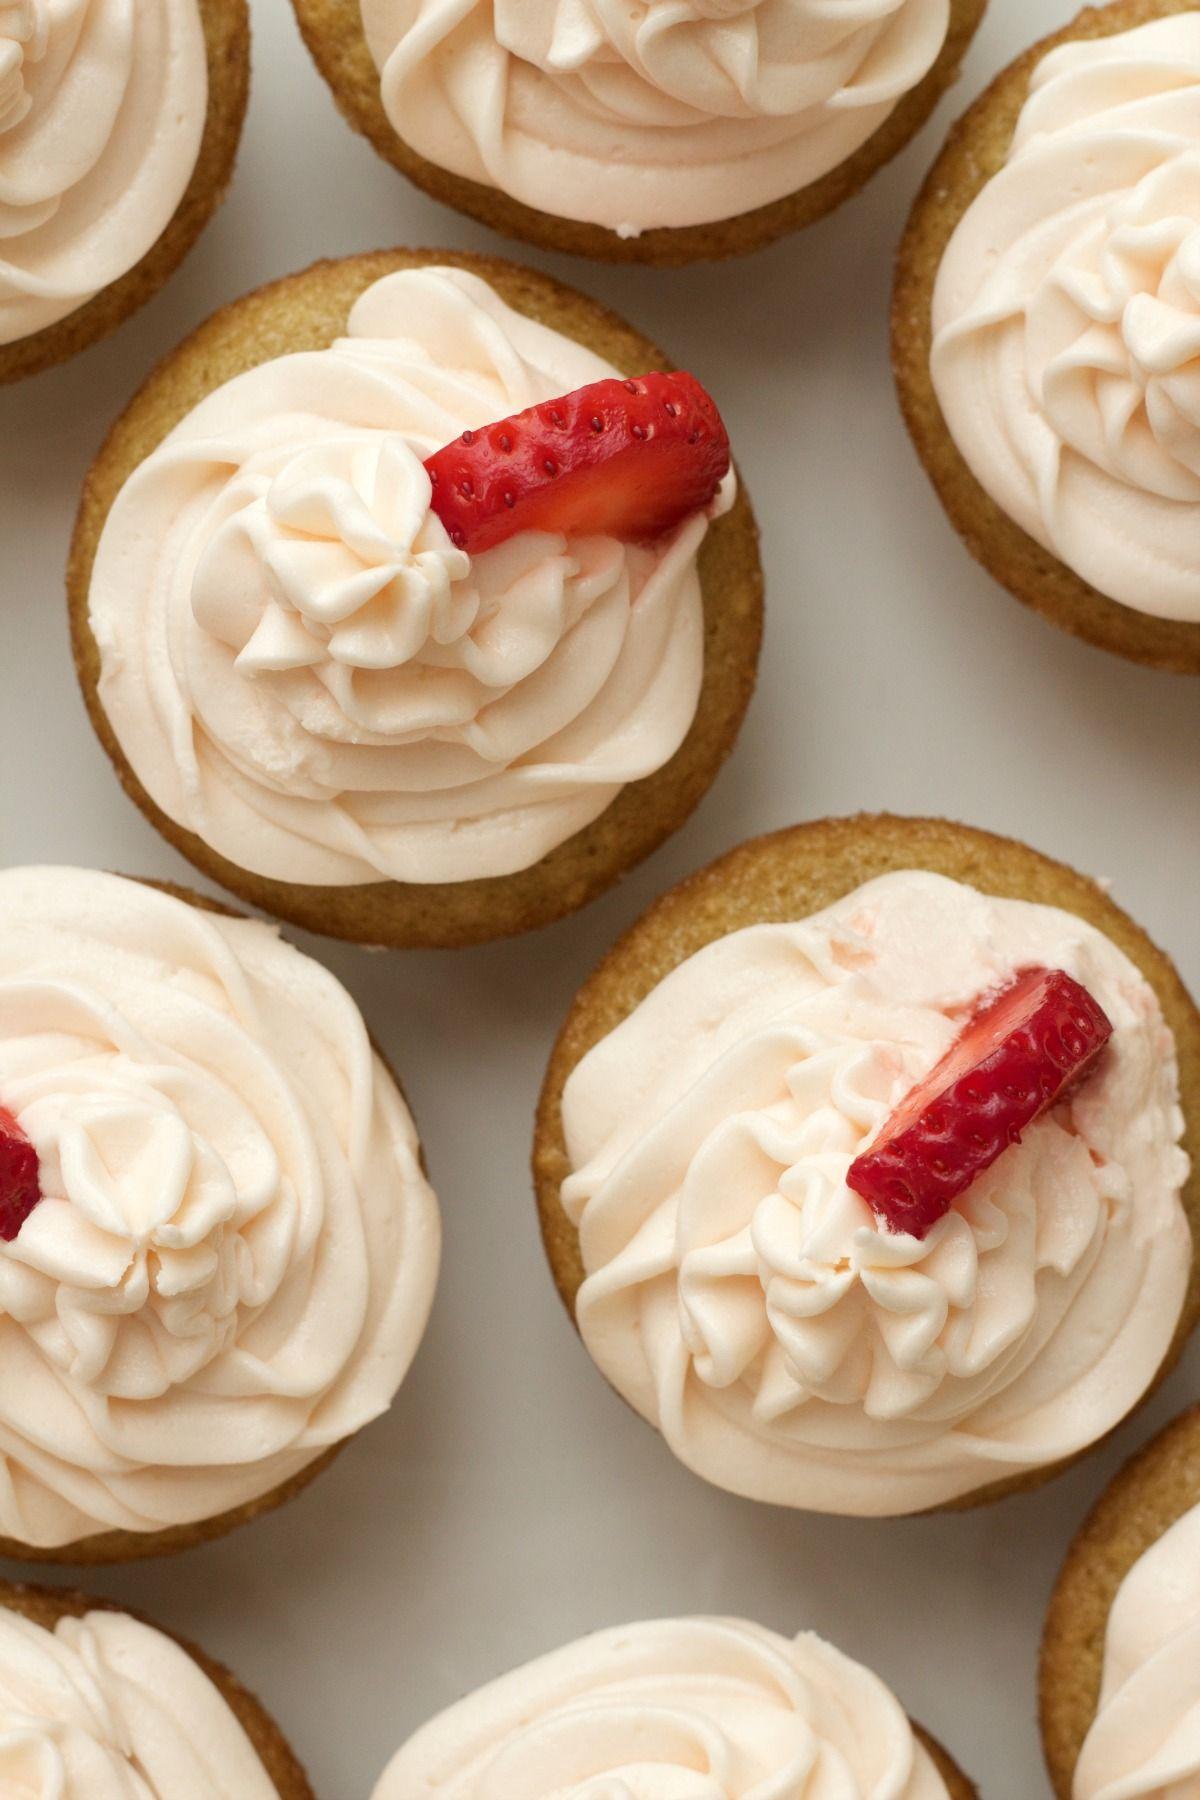 Vegan Vanilla Cupcakes With Strawberry Vanilla Frosting Vegan Lovingitvegan Vanilla Cupcakes De Vegan Vanilla Cupcakes Vegan Frosting Vanilla Vegan Sweets